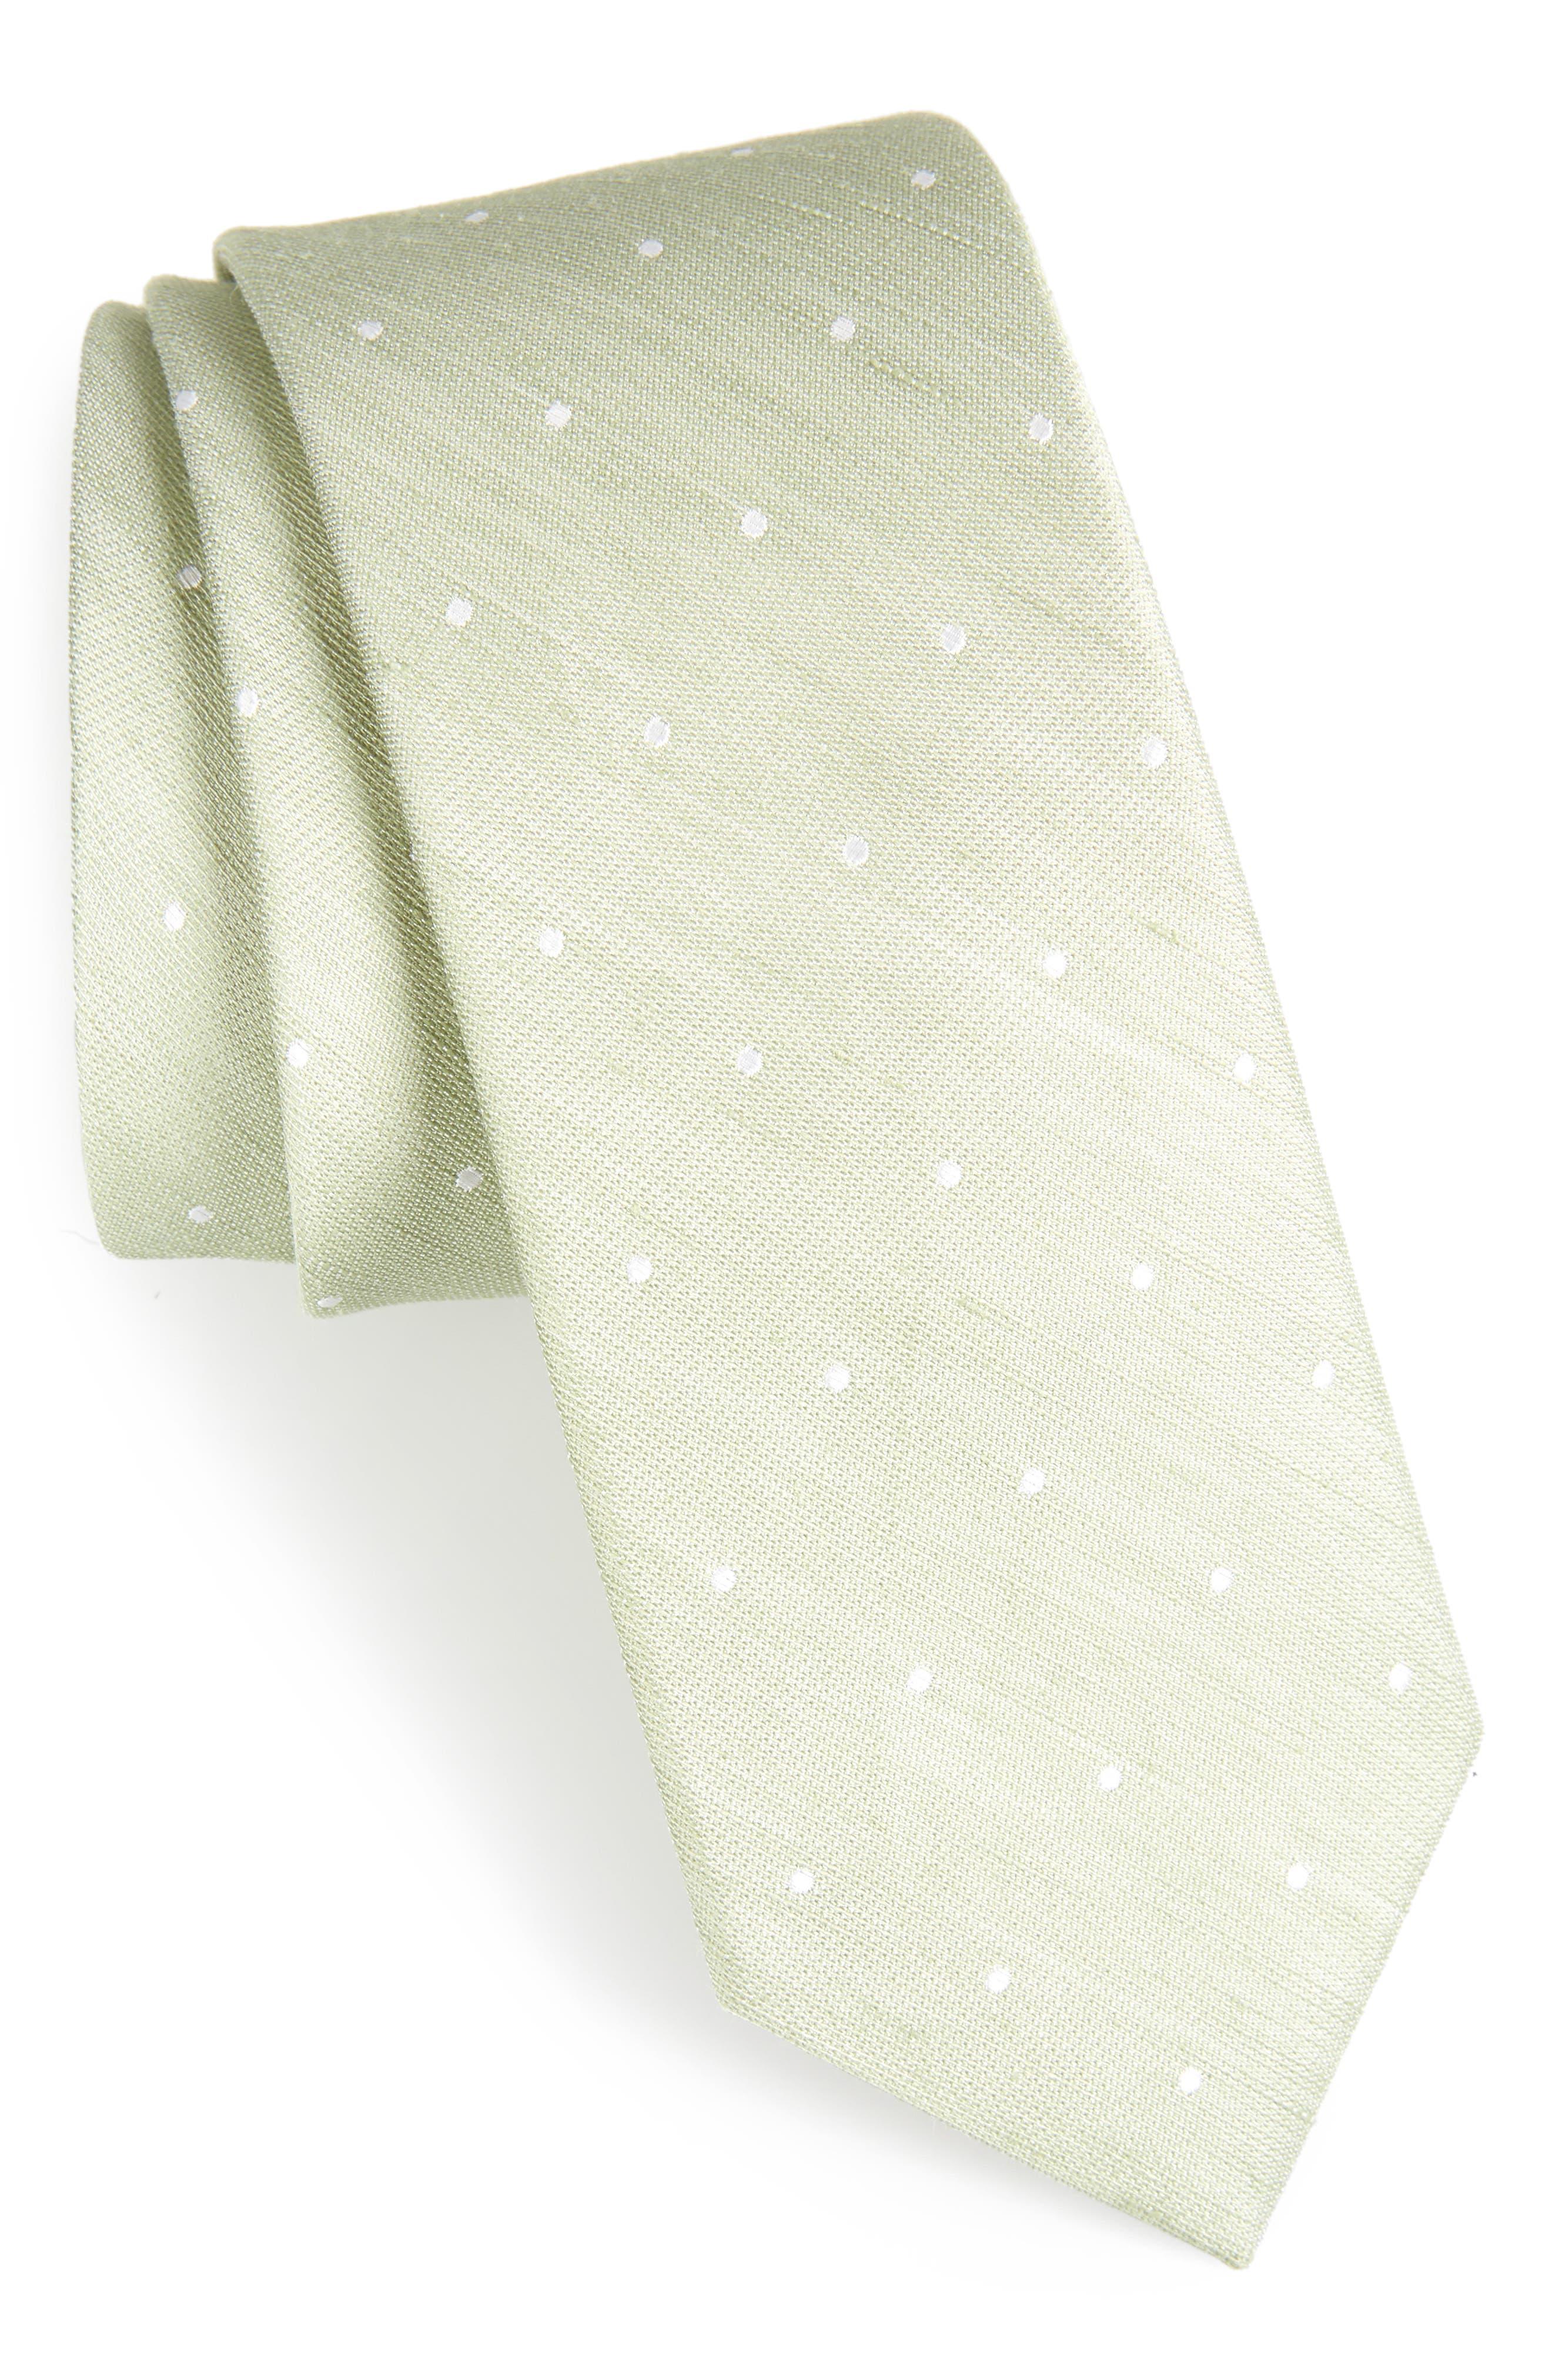 Bulletin Dot Silk & Linen Tie,                             Main thumbnail 1, color,                             Sage Green